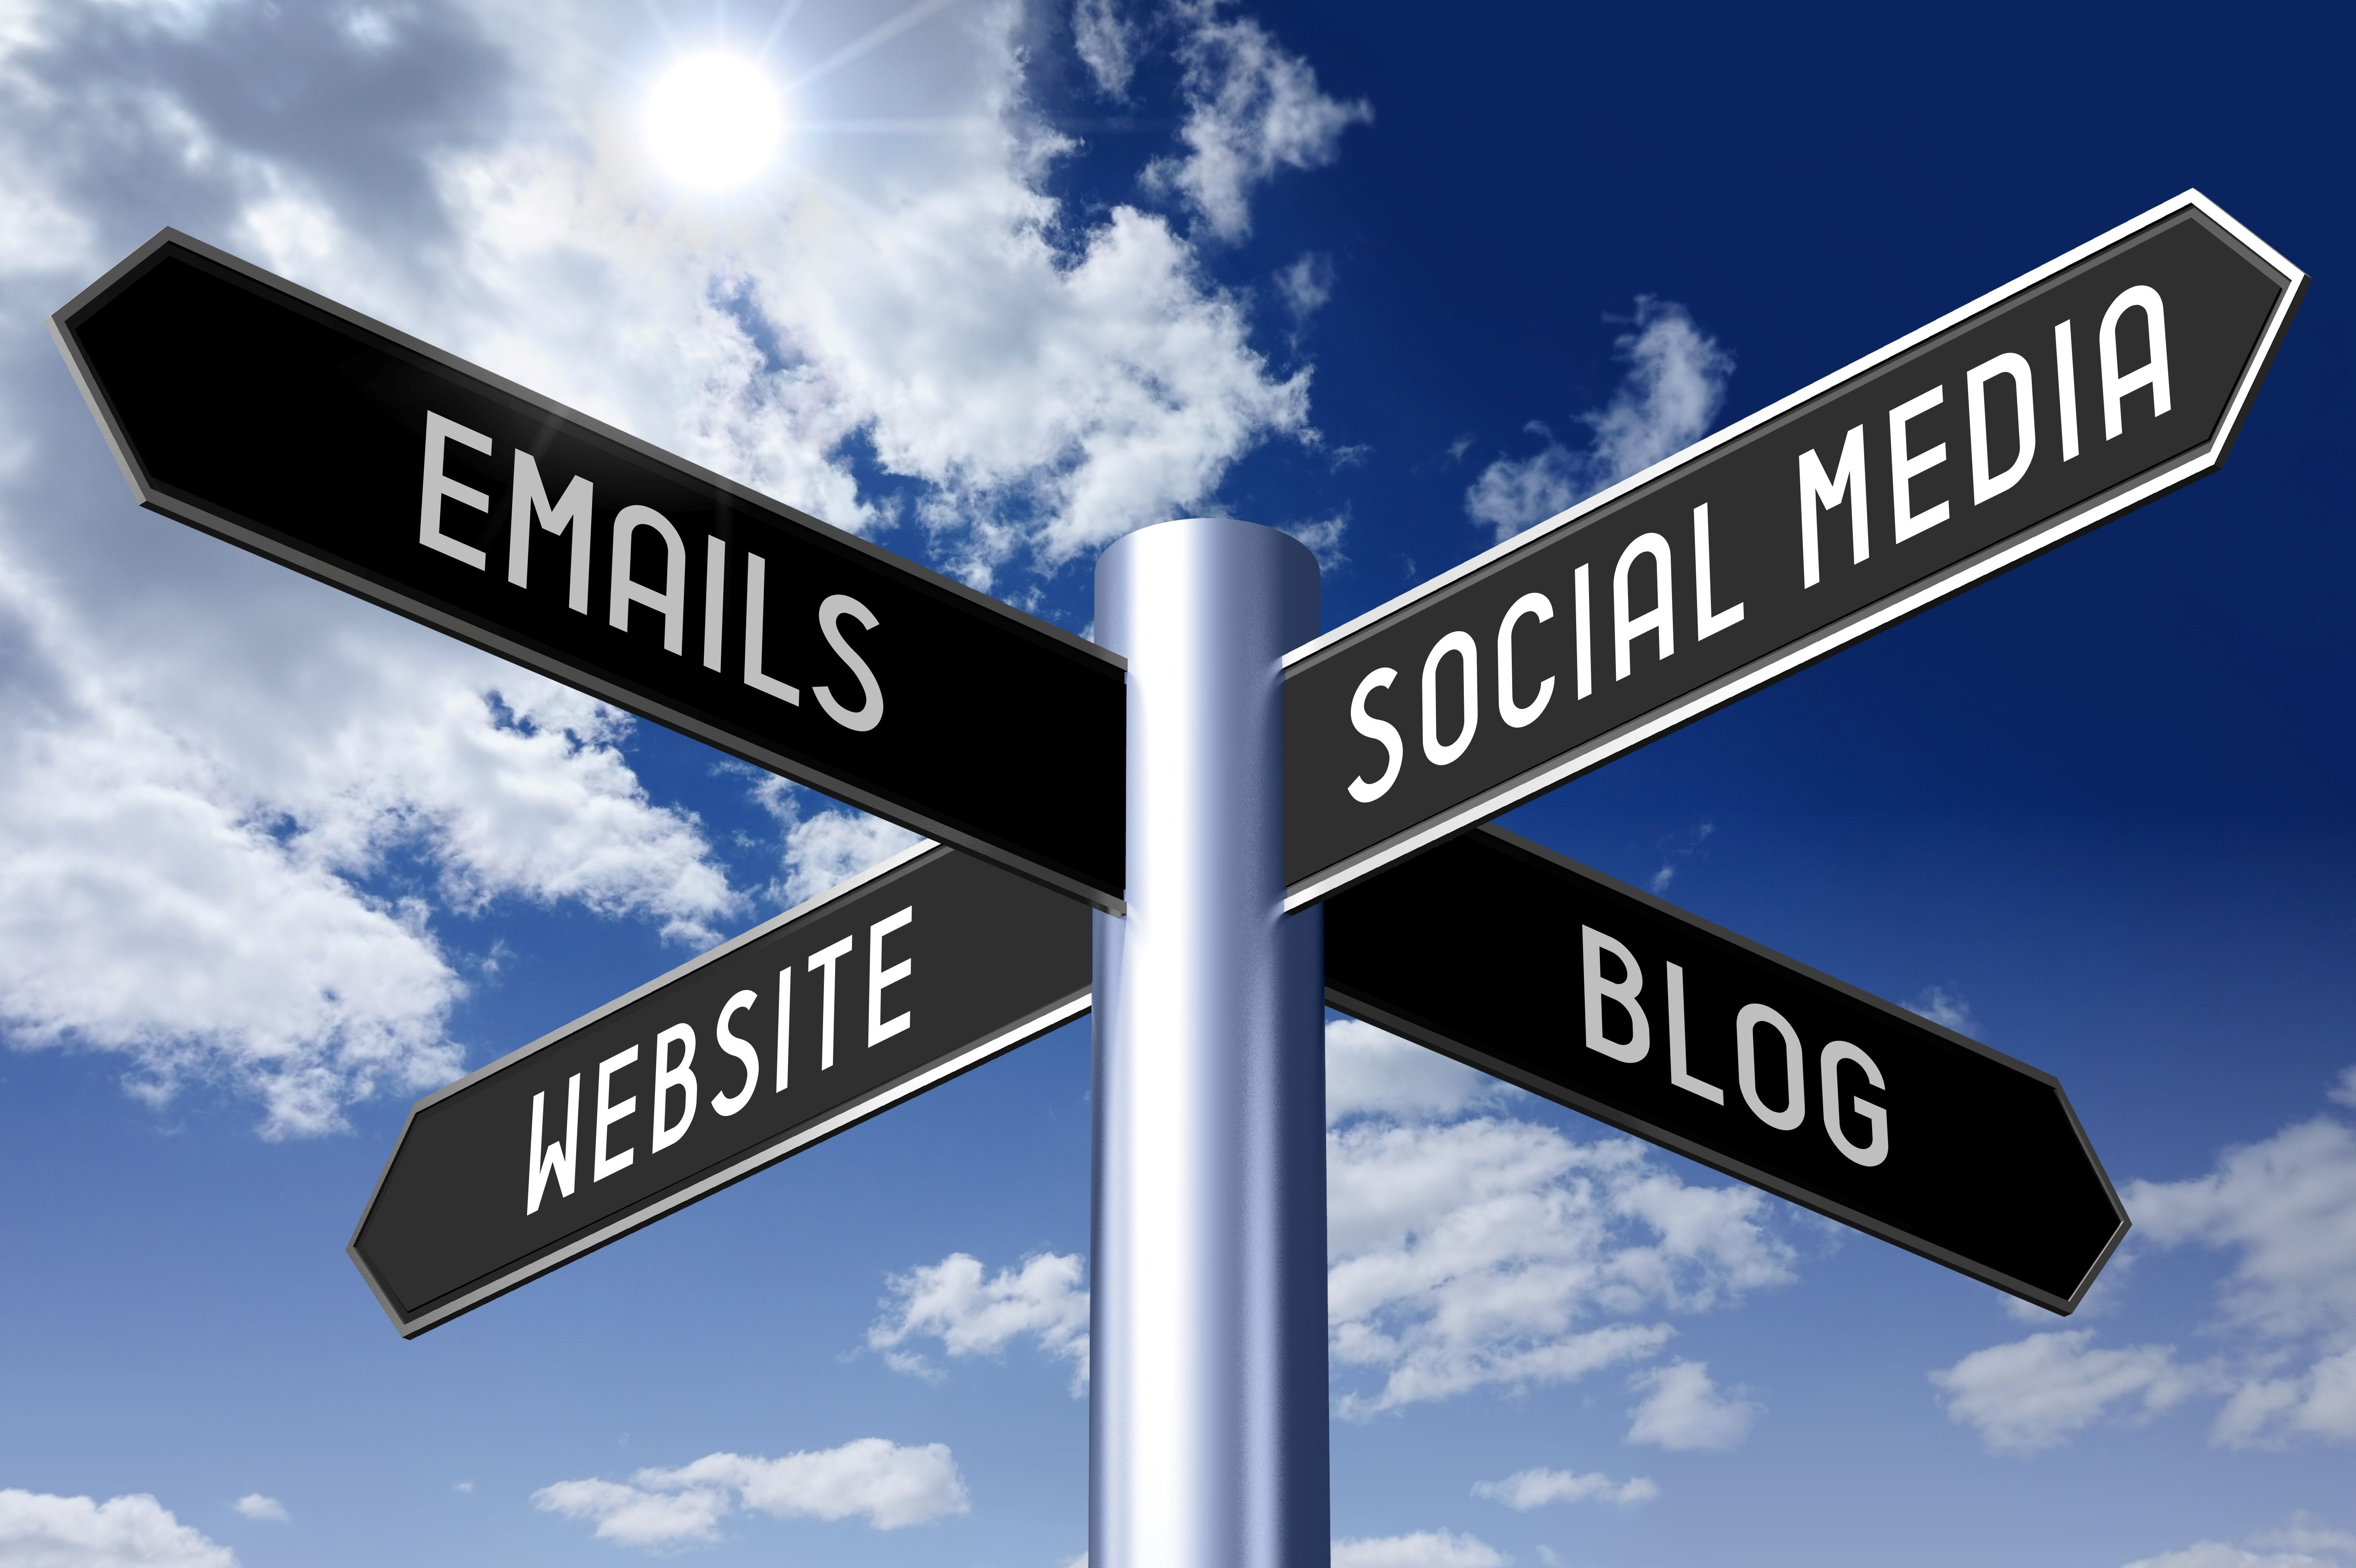 blogging-secrets-the-ethics-of-making-money-2